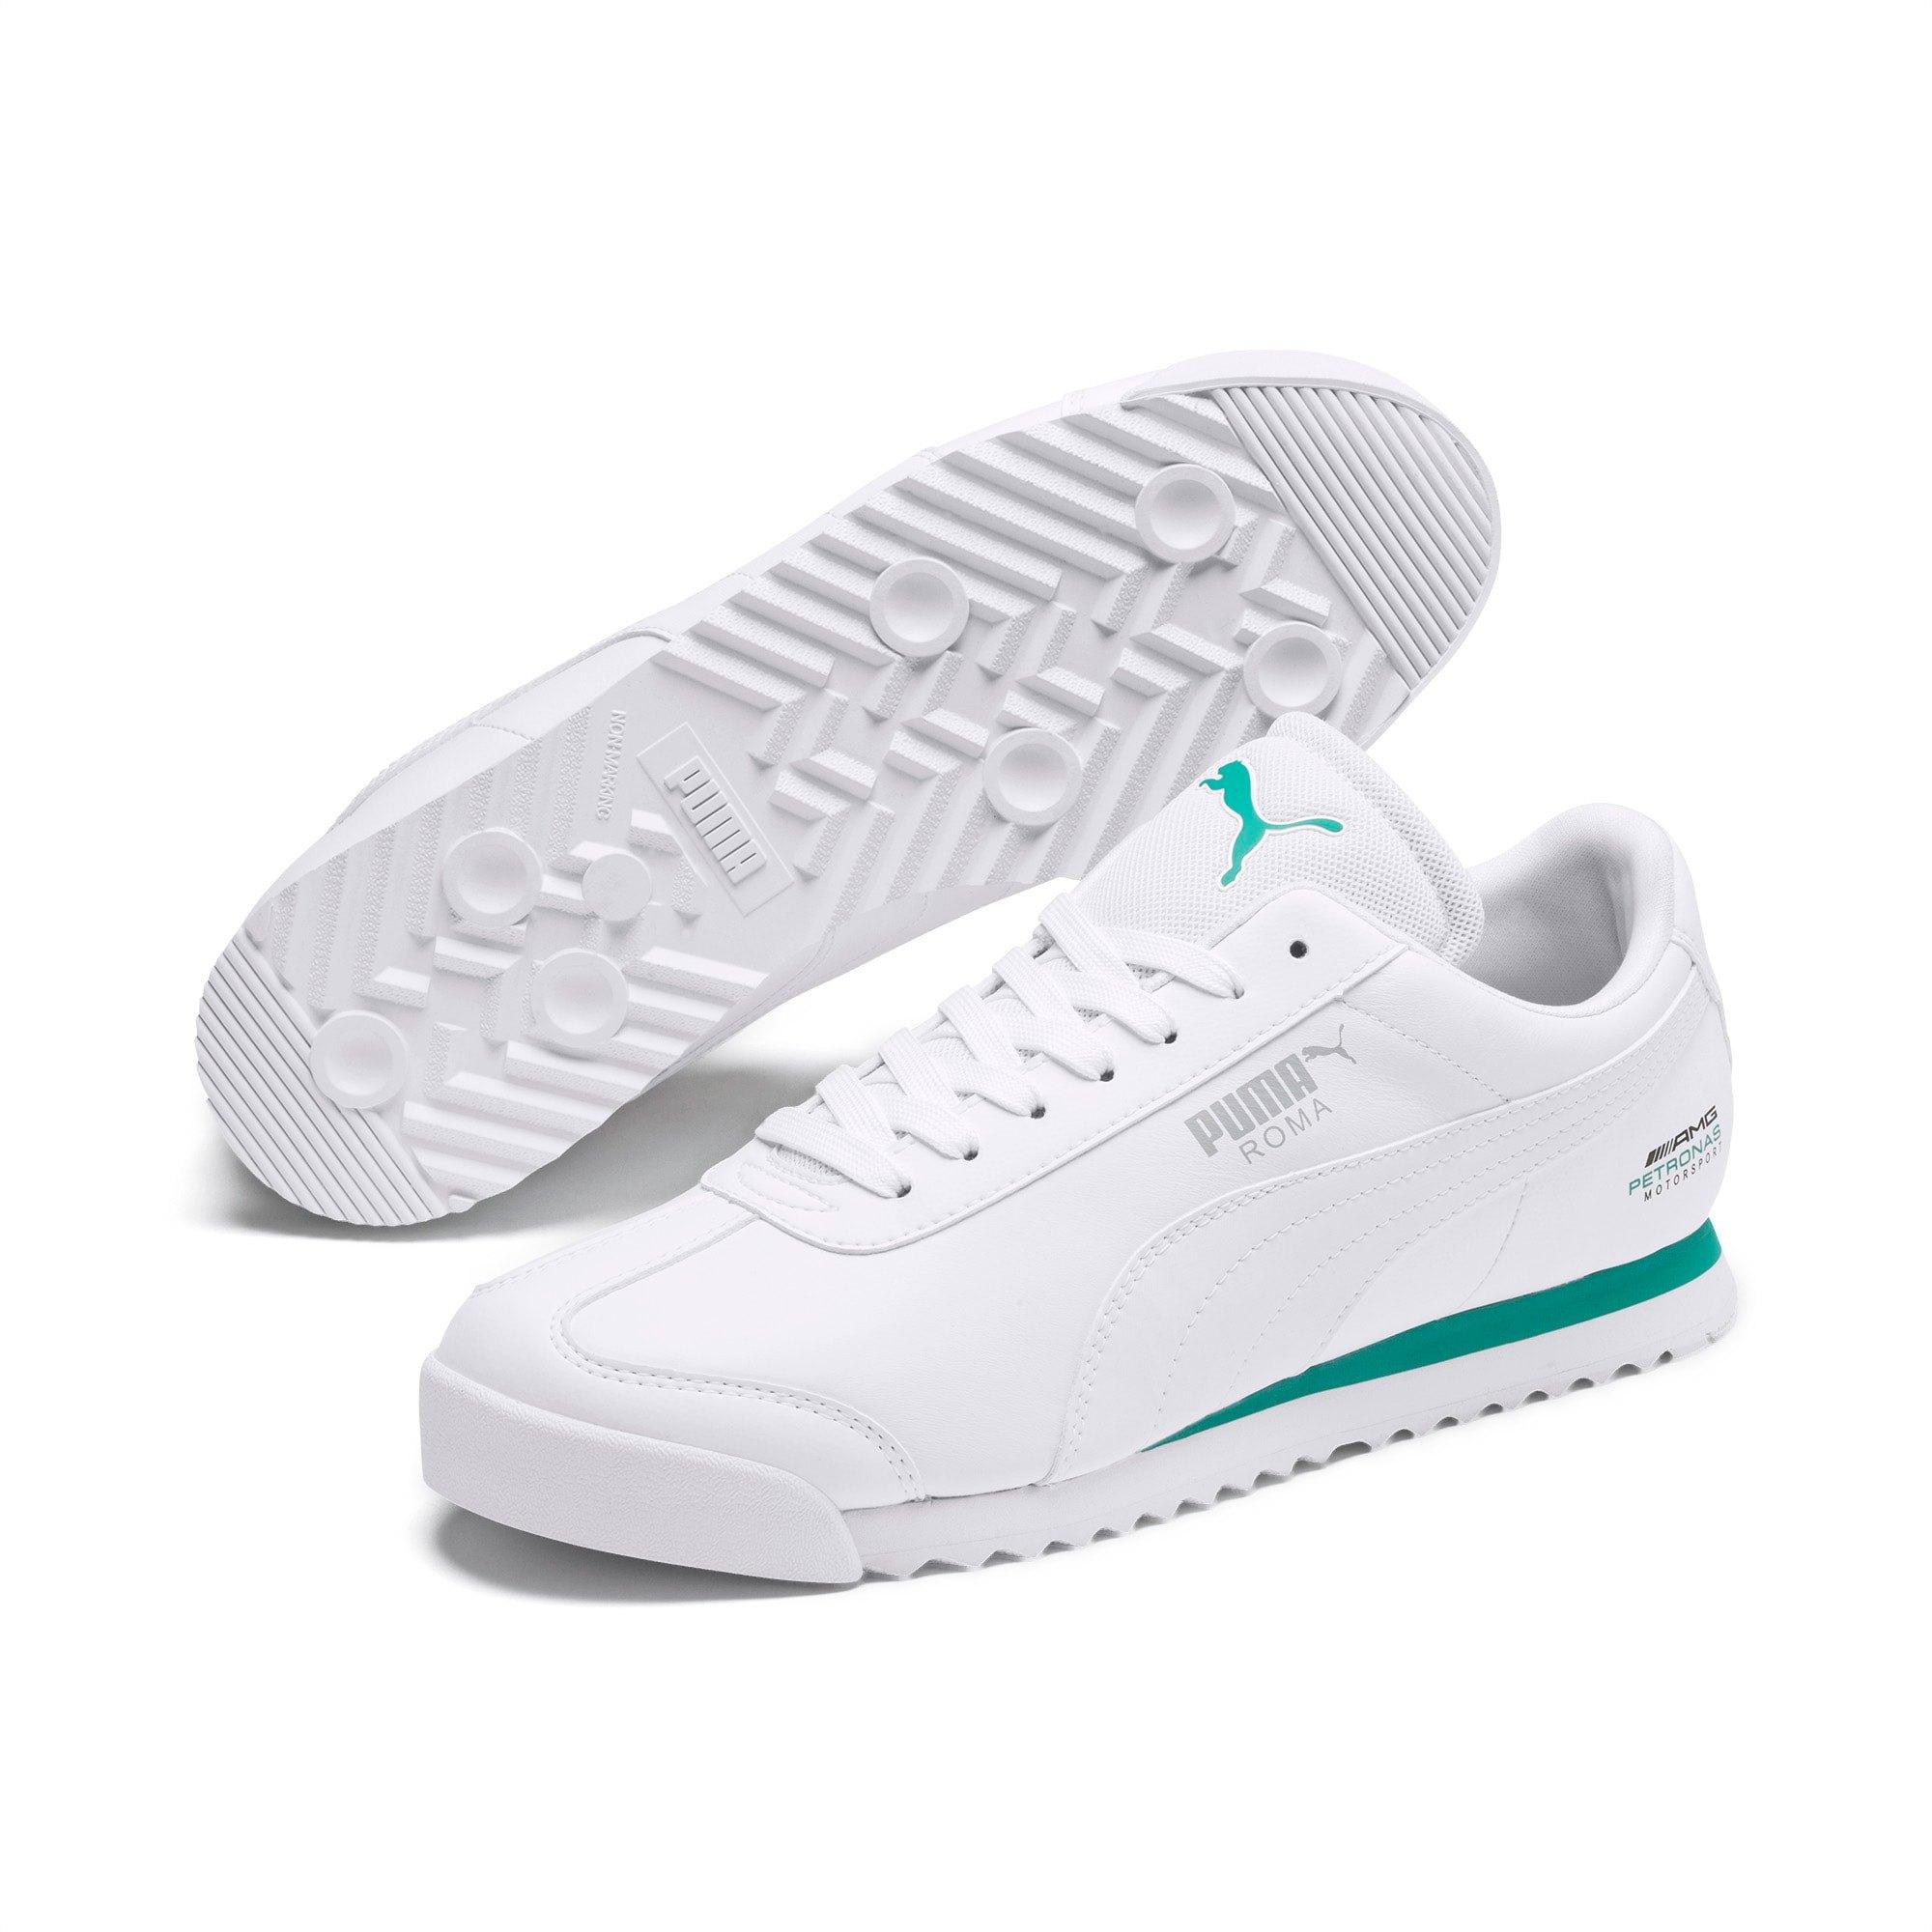 339872_02 Running Shoes Puma Roma